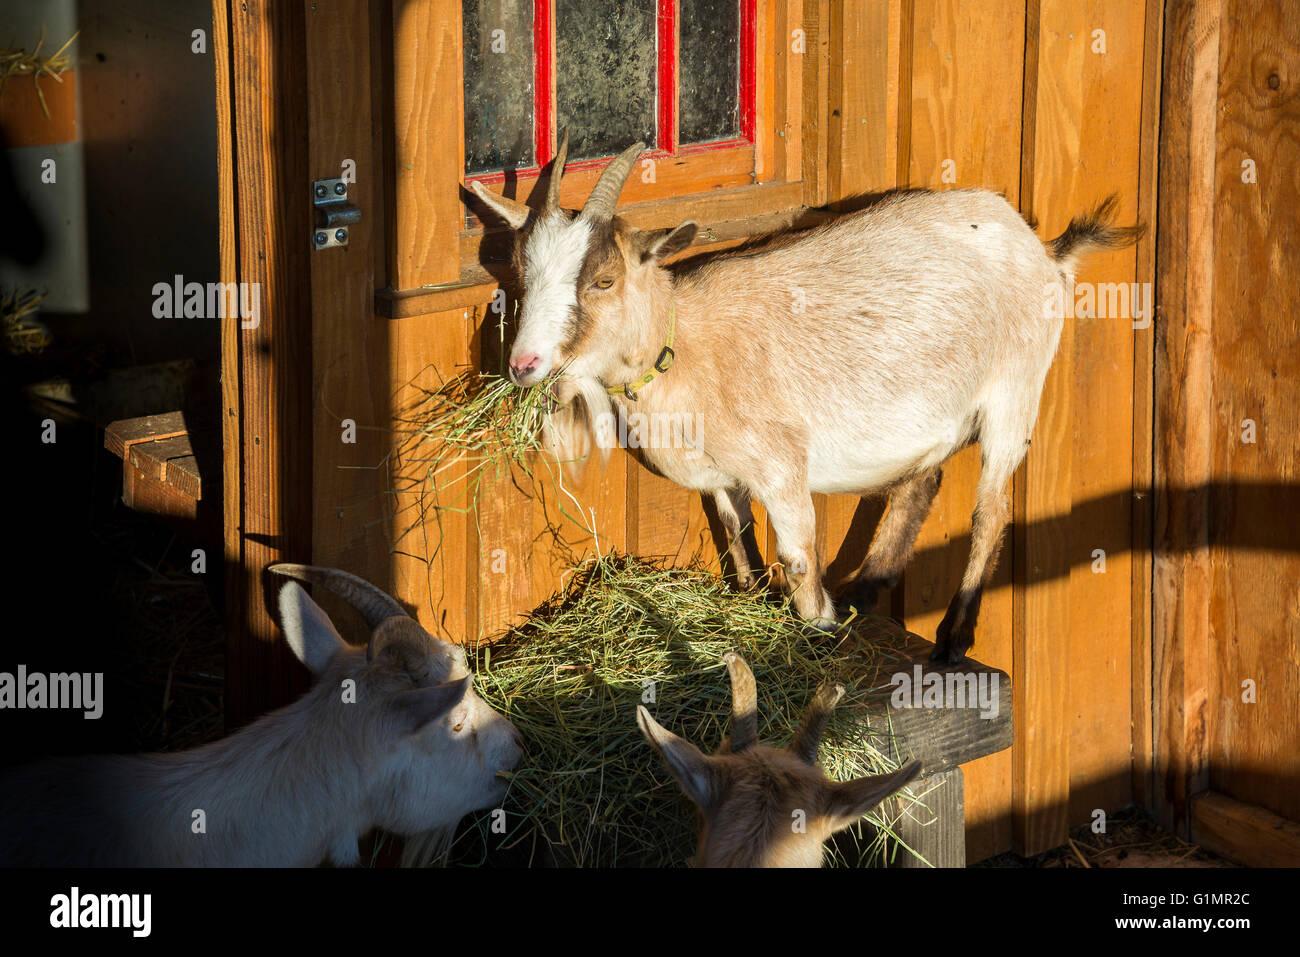 Goat eating straw, Westham Island Herb Farm, Ladner, British Columbia, Canada - Stock Image